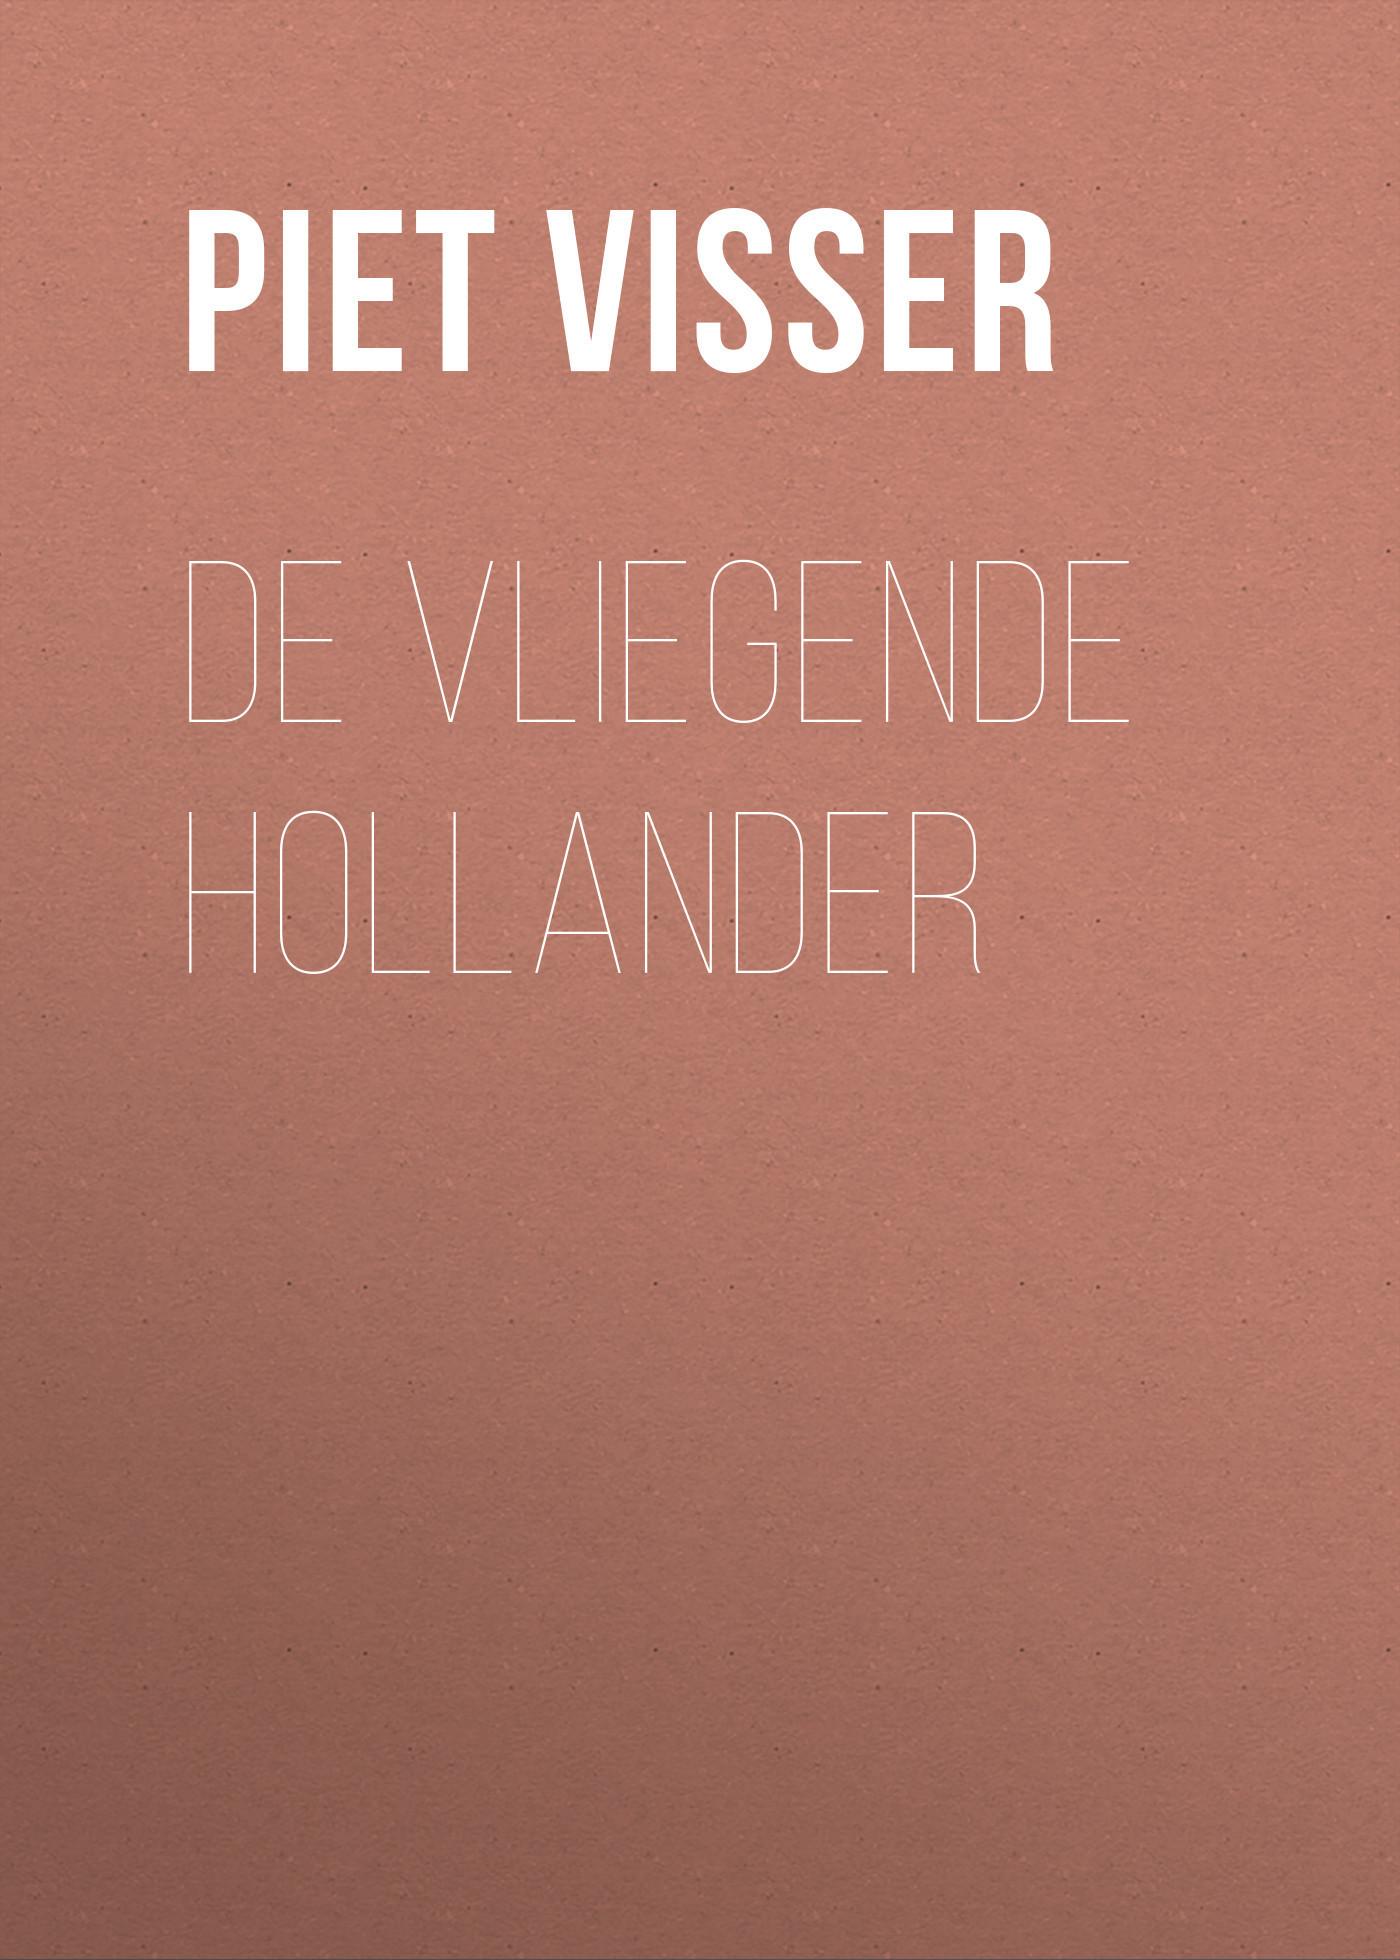 Piet Visser De vliegende Hollander jp a calosse piet mondrian